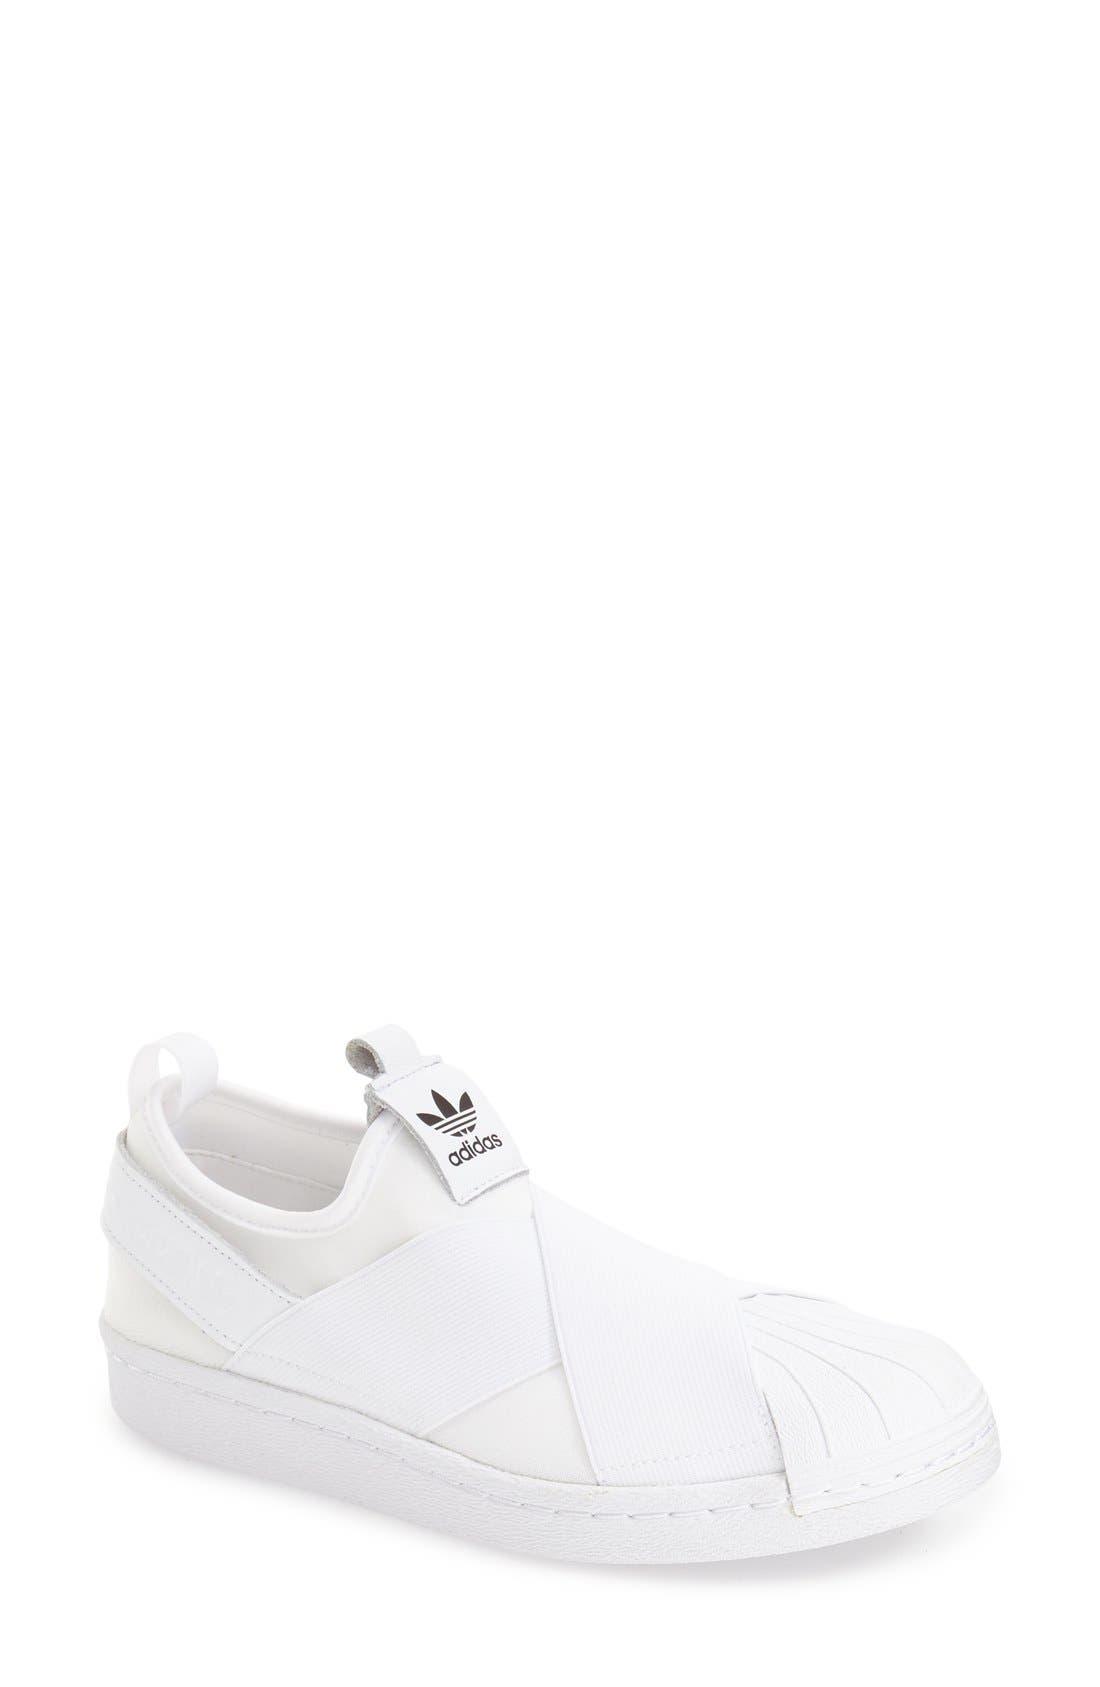 ADIDAS 'Superstar' Slip-On Sneaker